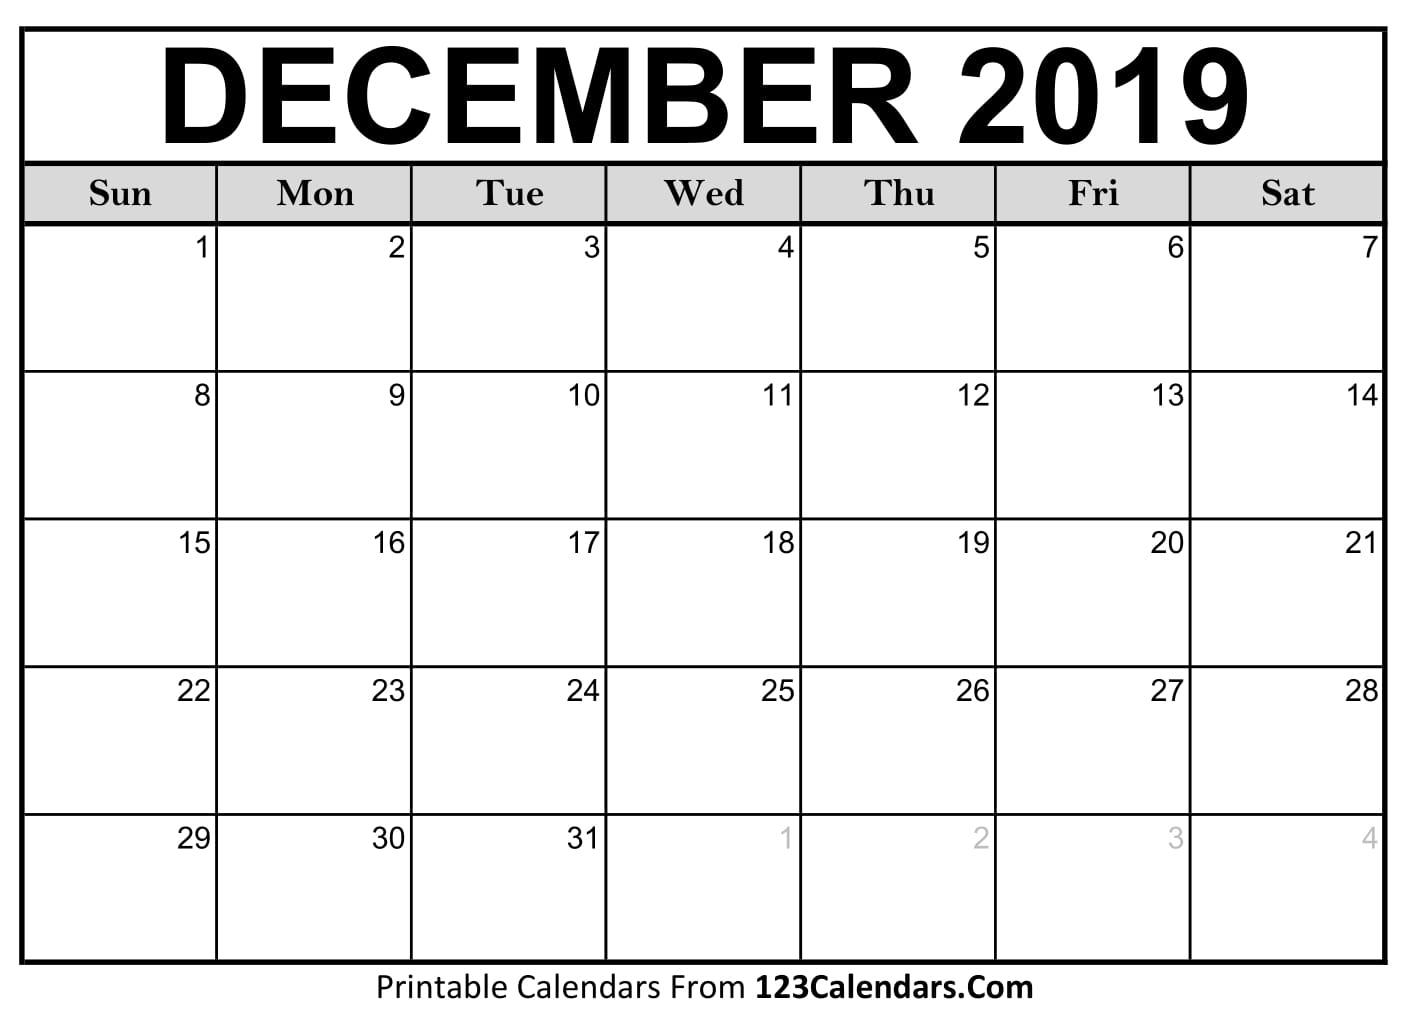 December 2019 Printable Calendar   123Calendars in Blank Dec Calendar Printable